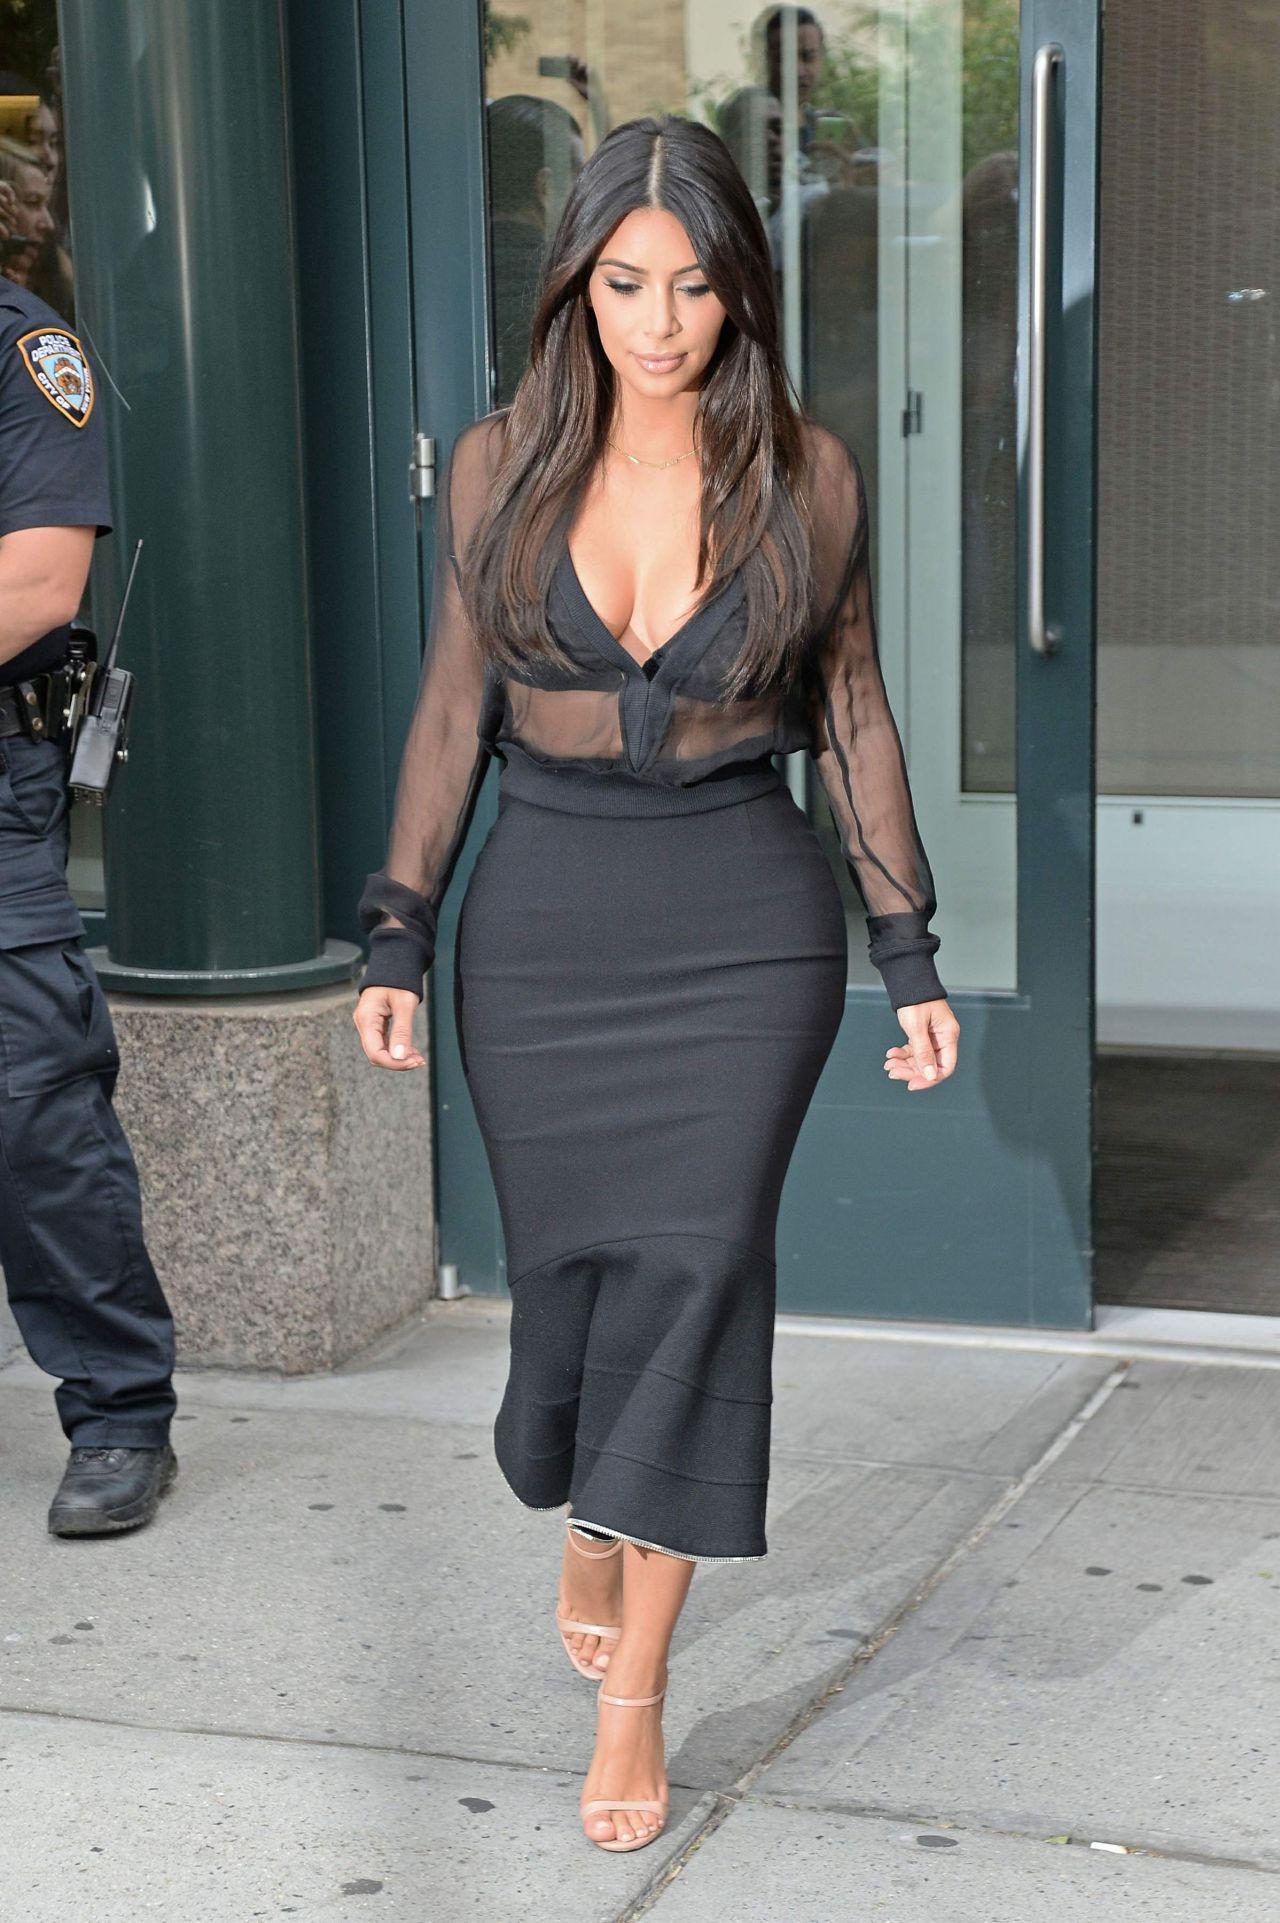 Kim Kardashian Met Gala Looks, Ranked From Most To Least